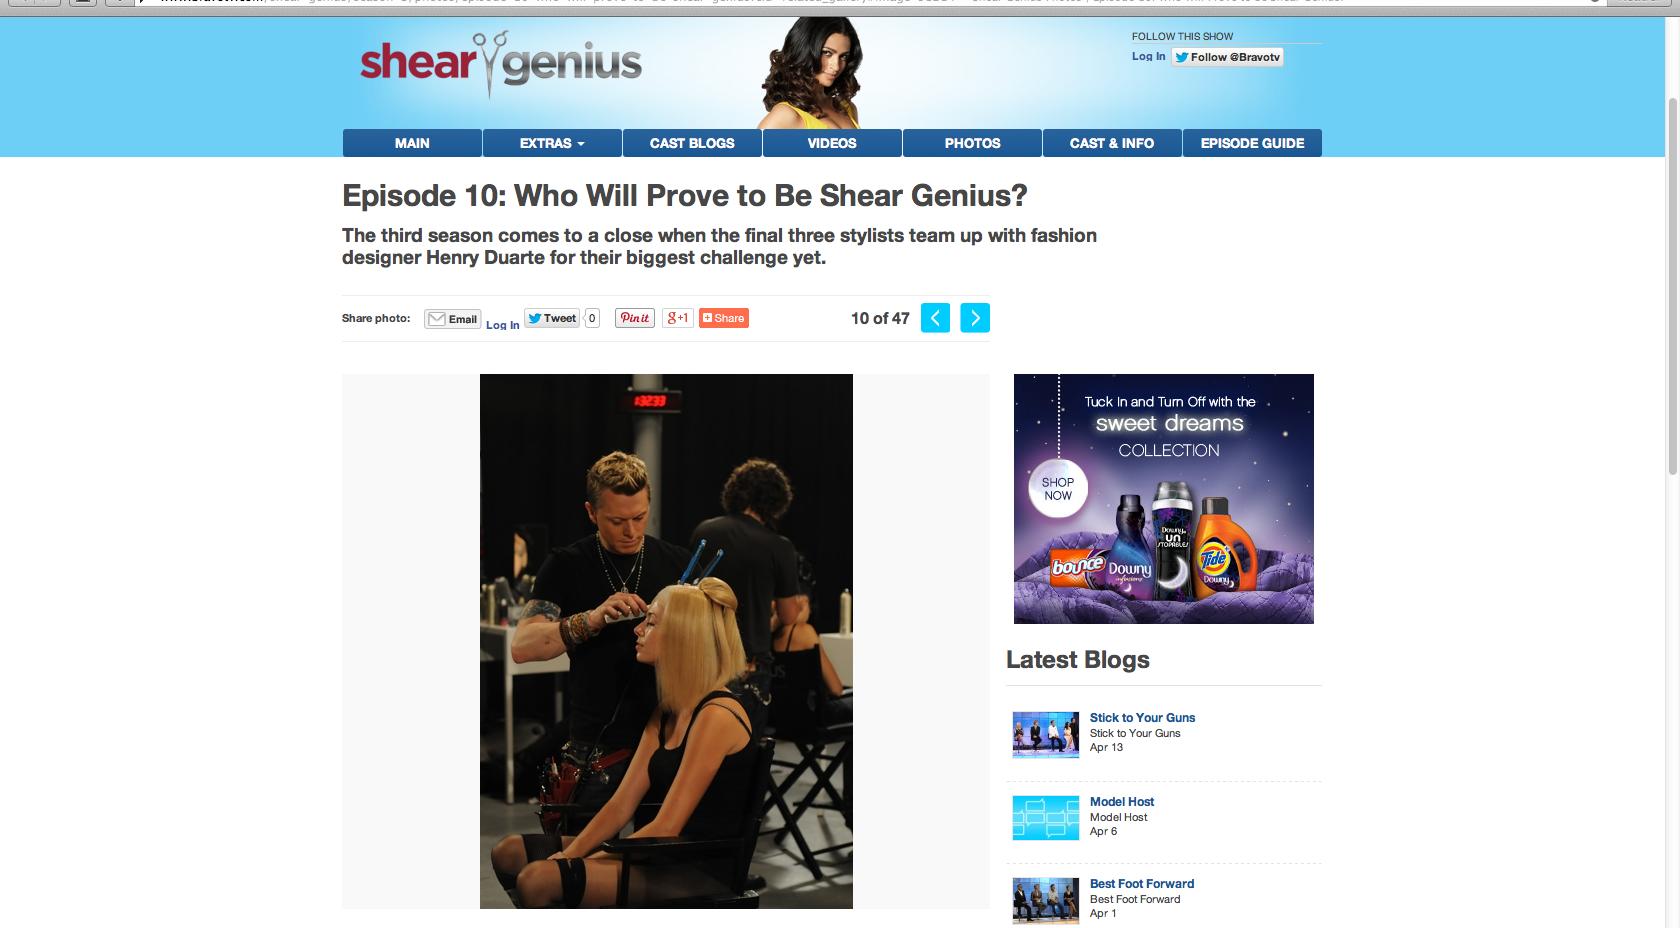 Bravo's Shear Genius